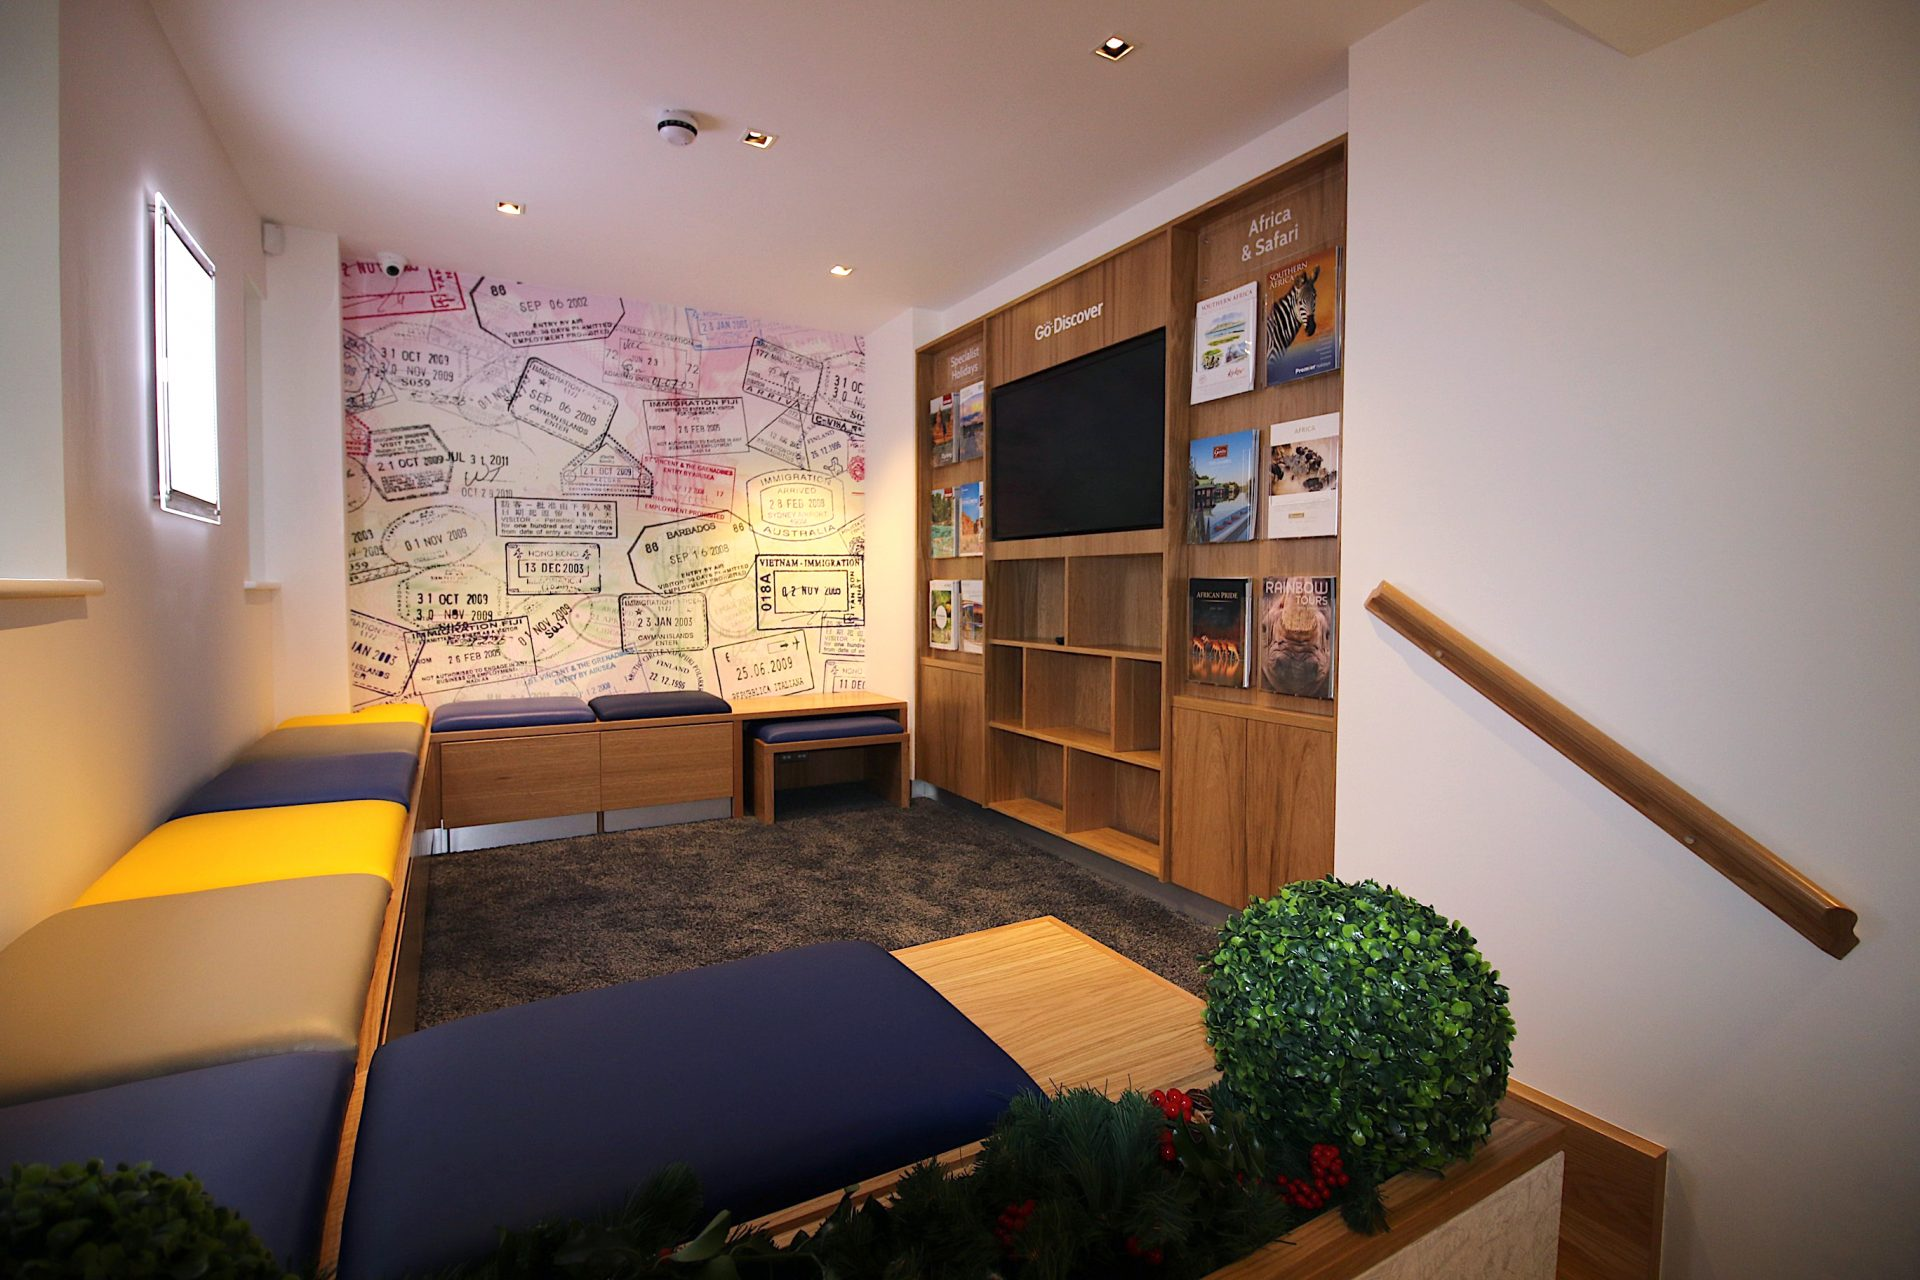 Go Travel_Chislhrust_Interior Design By Nugget Design 03